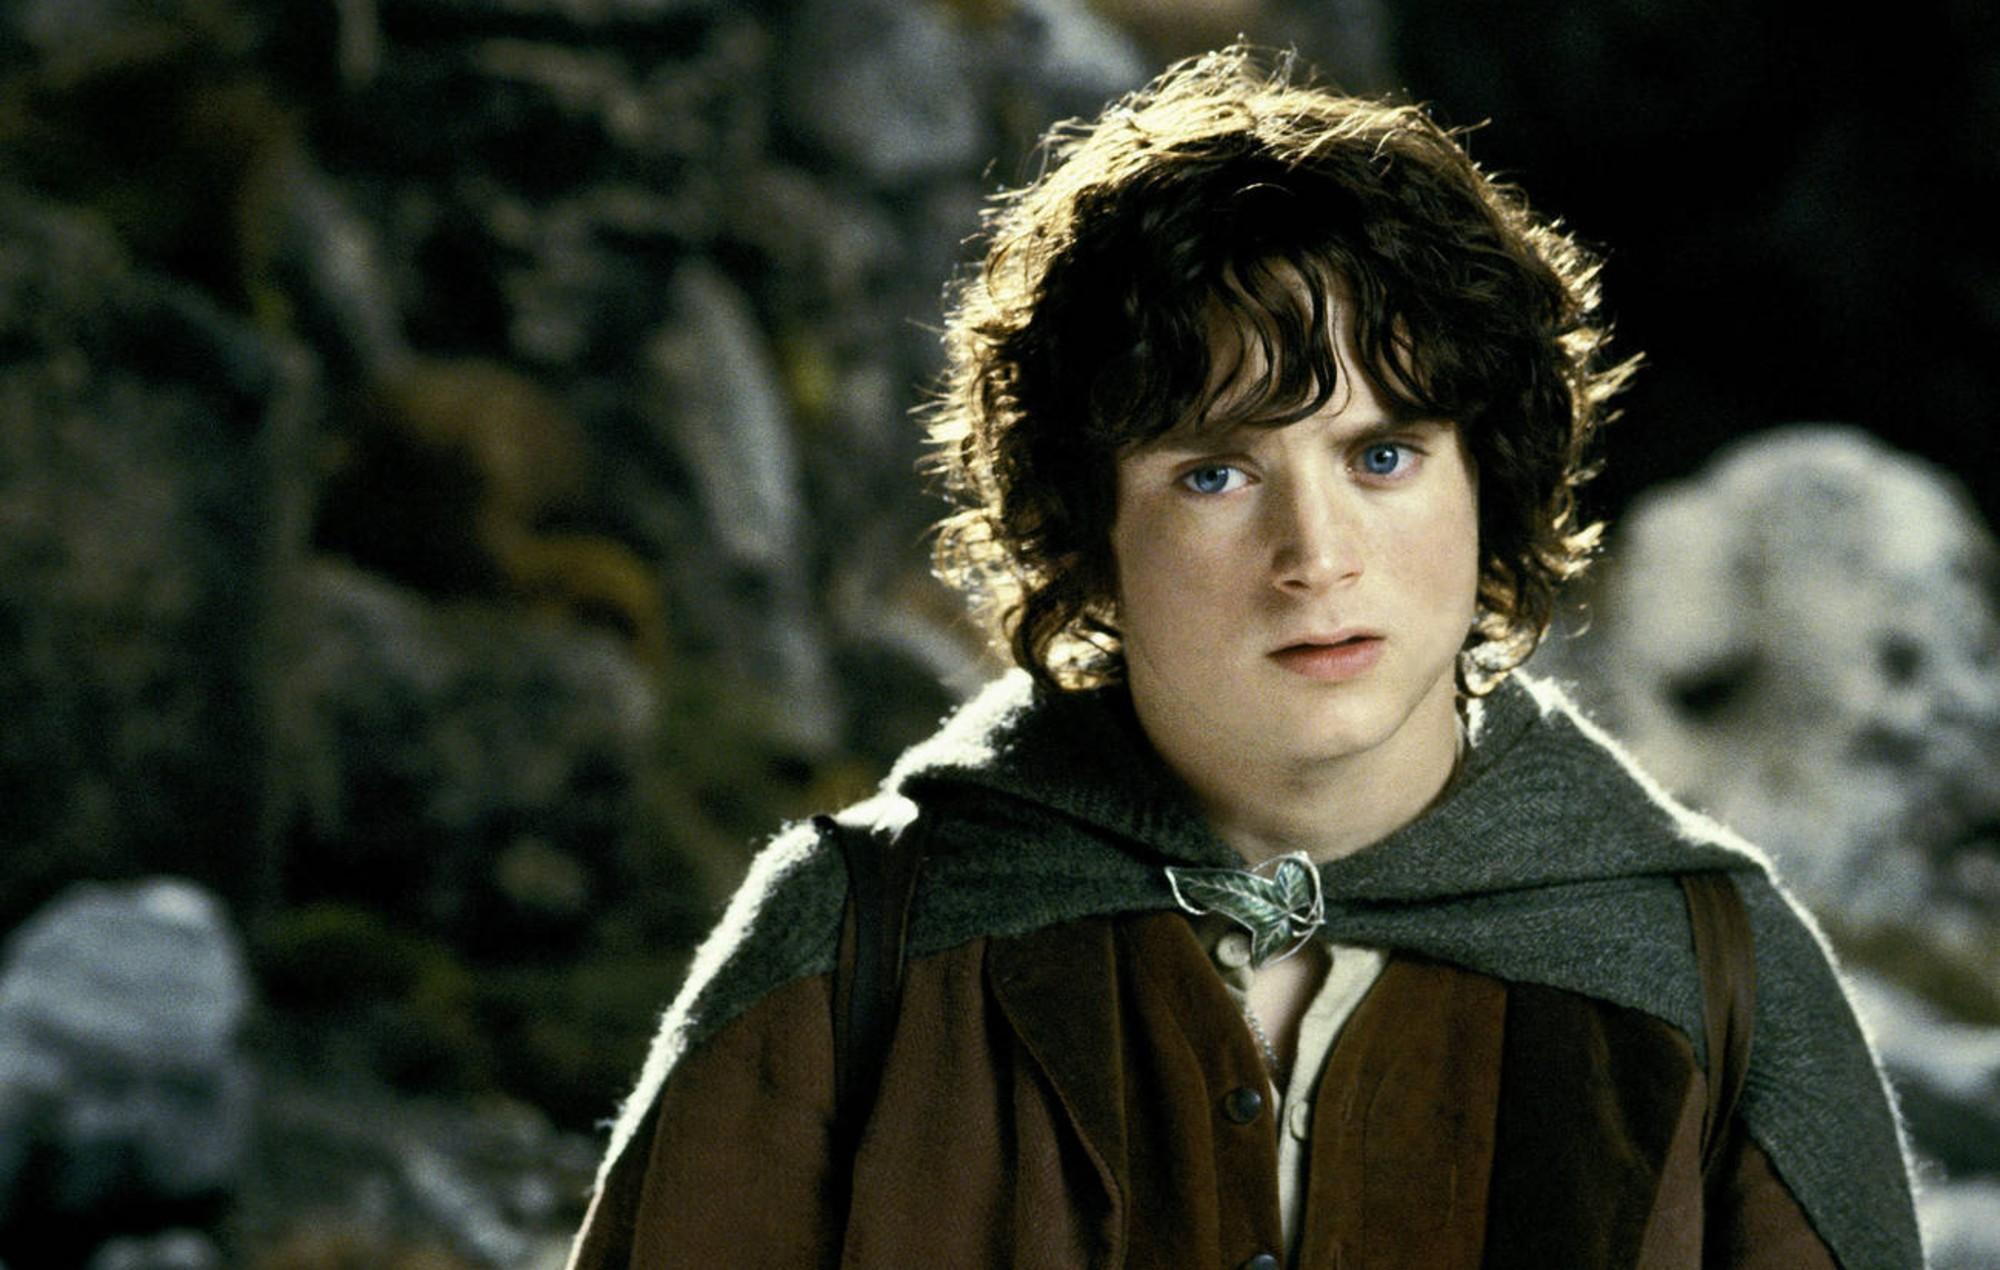 Elijah Wood as Frodo Baggins in 'The Lord of the Rings'